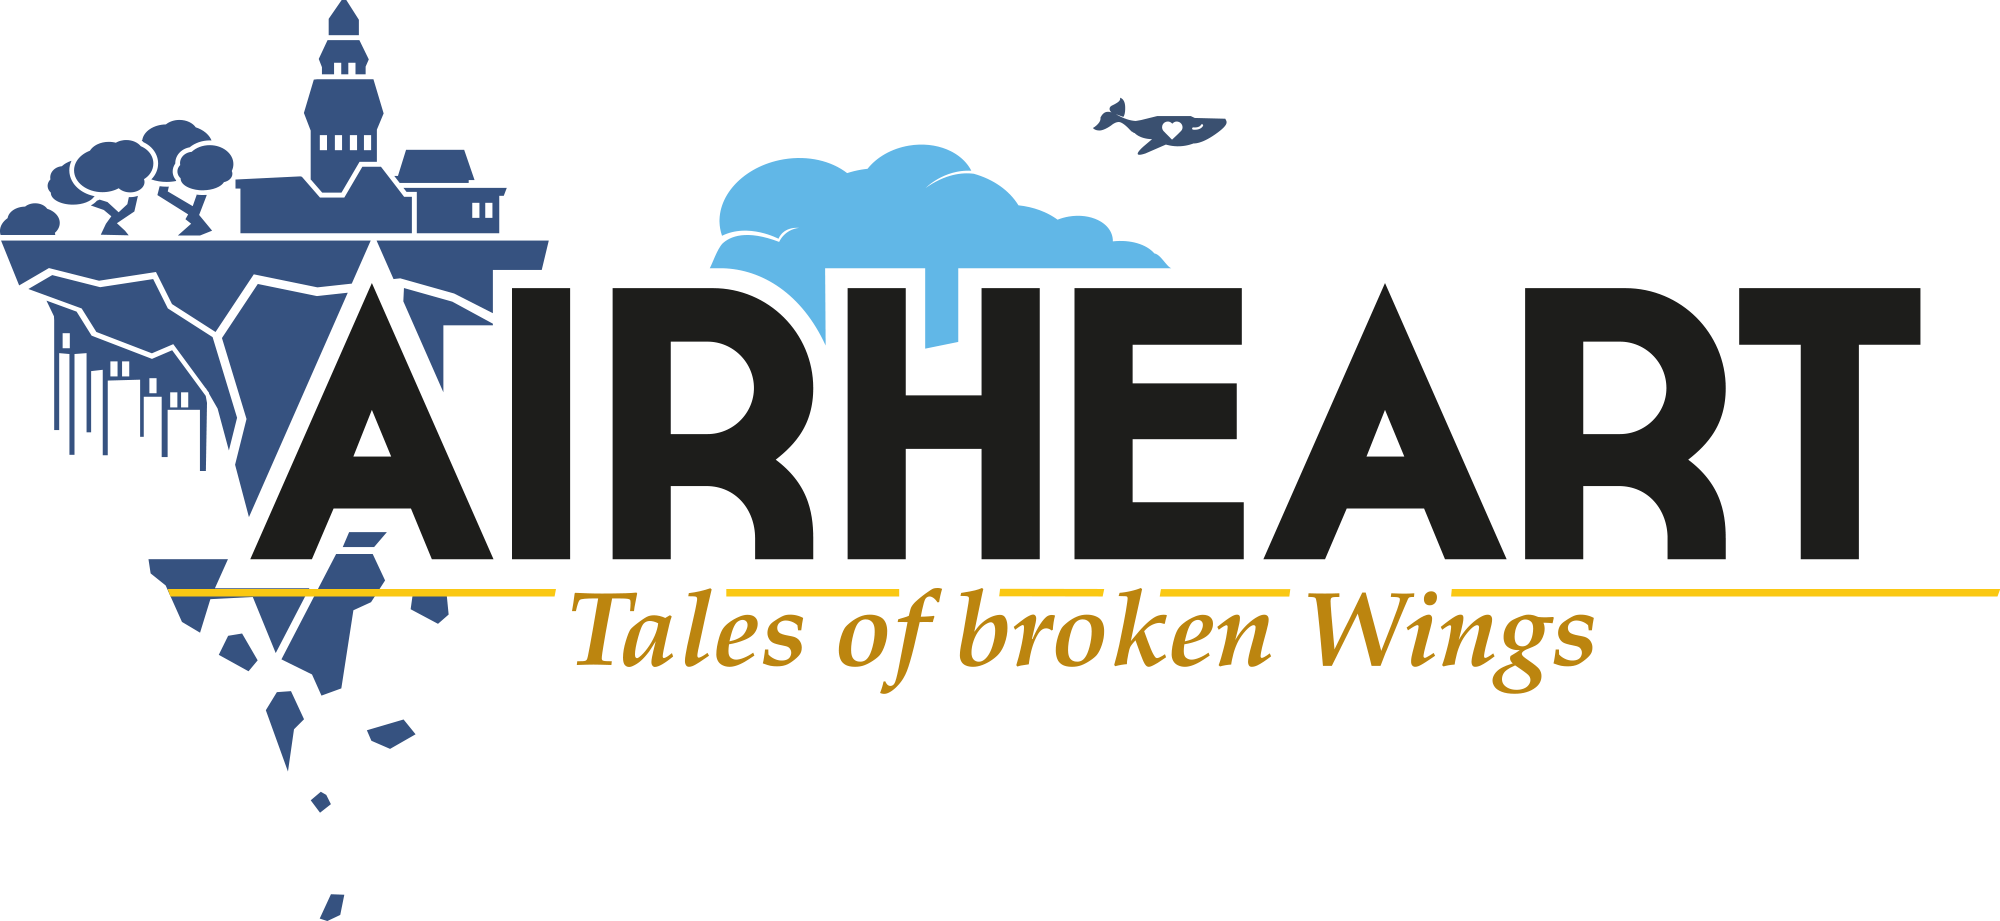 http://presskit.blindflugstudios.com/airheart_tales_of_broken_wings/images/logo.png